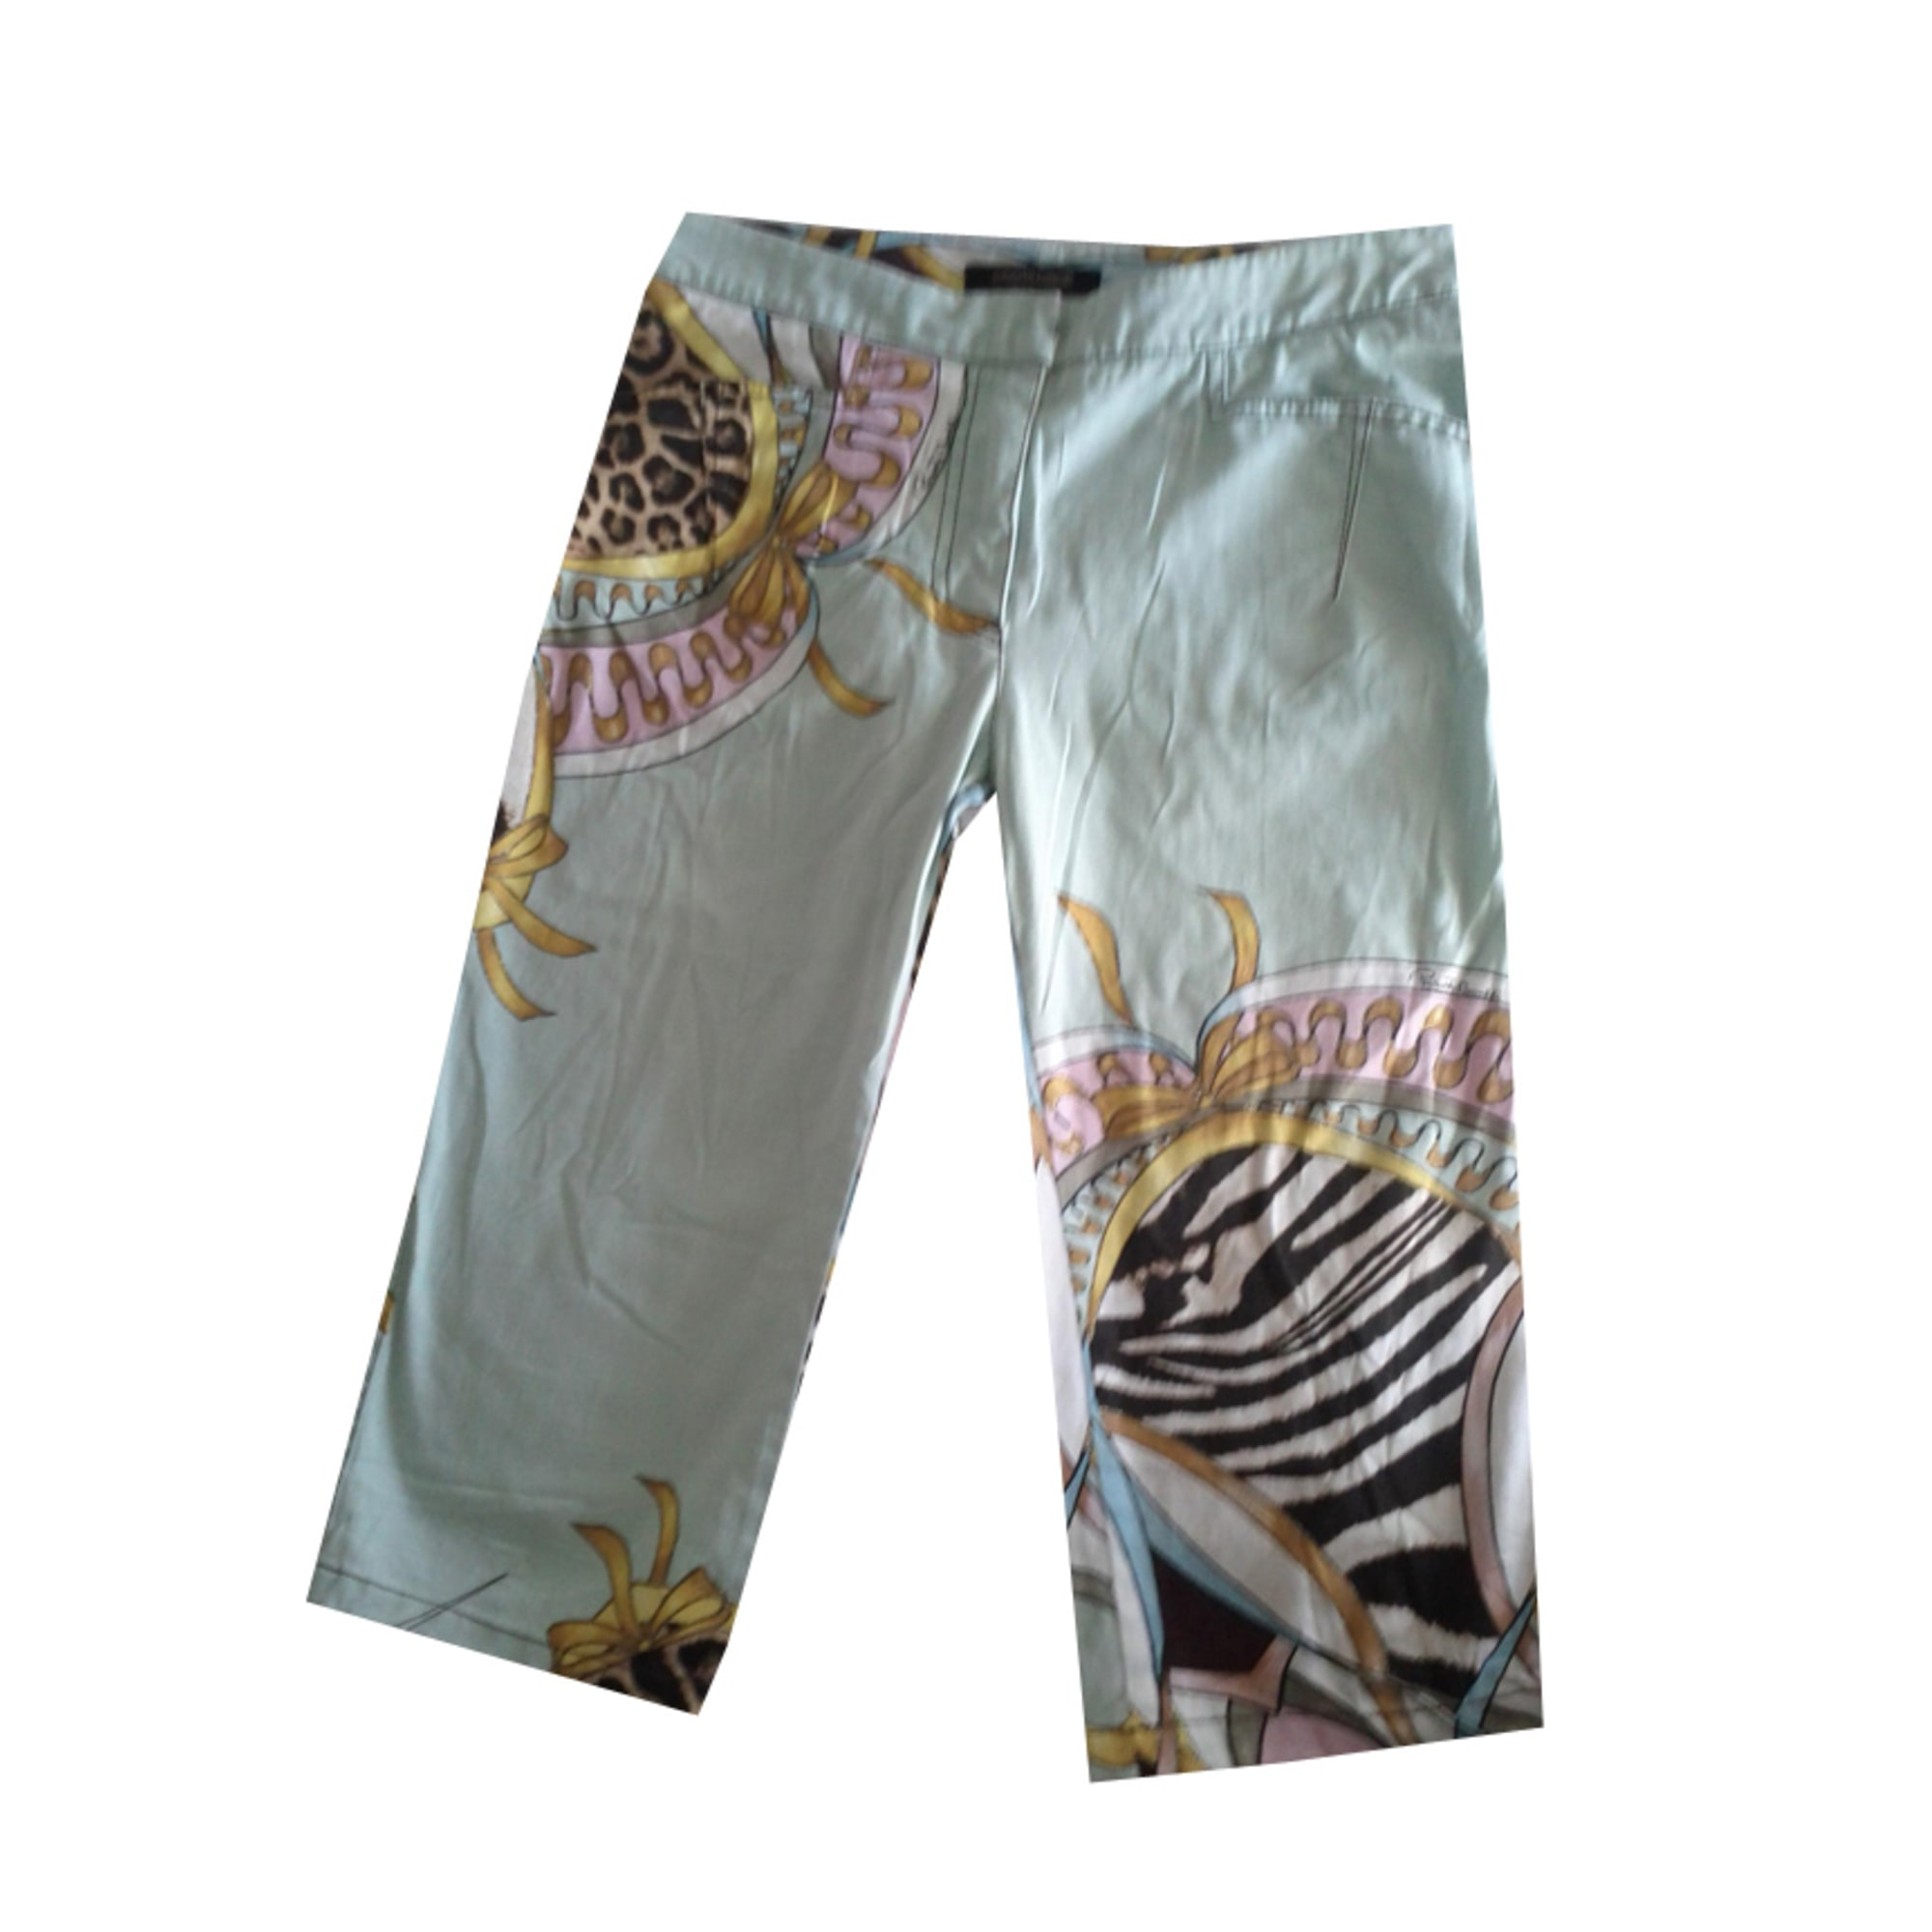 Pantalon slim, cigarette ROBERTO CAVALLI Imprimés animaliers